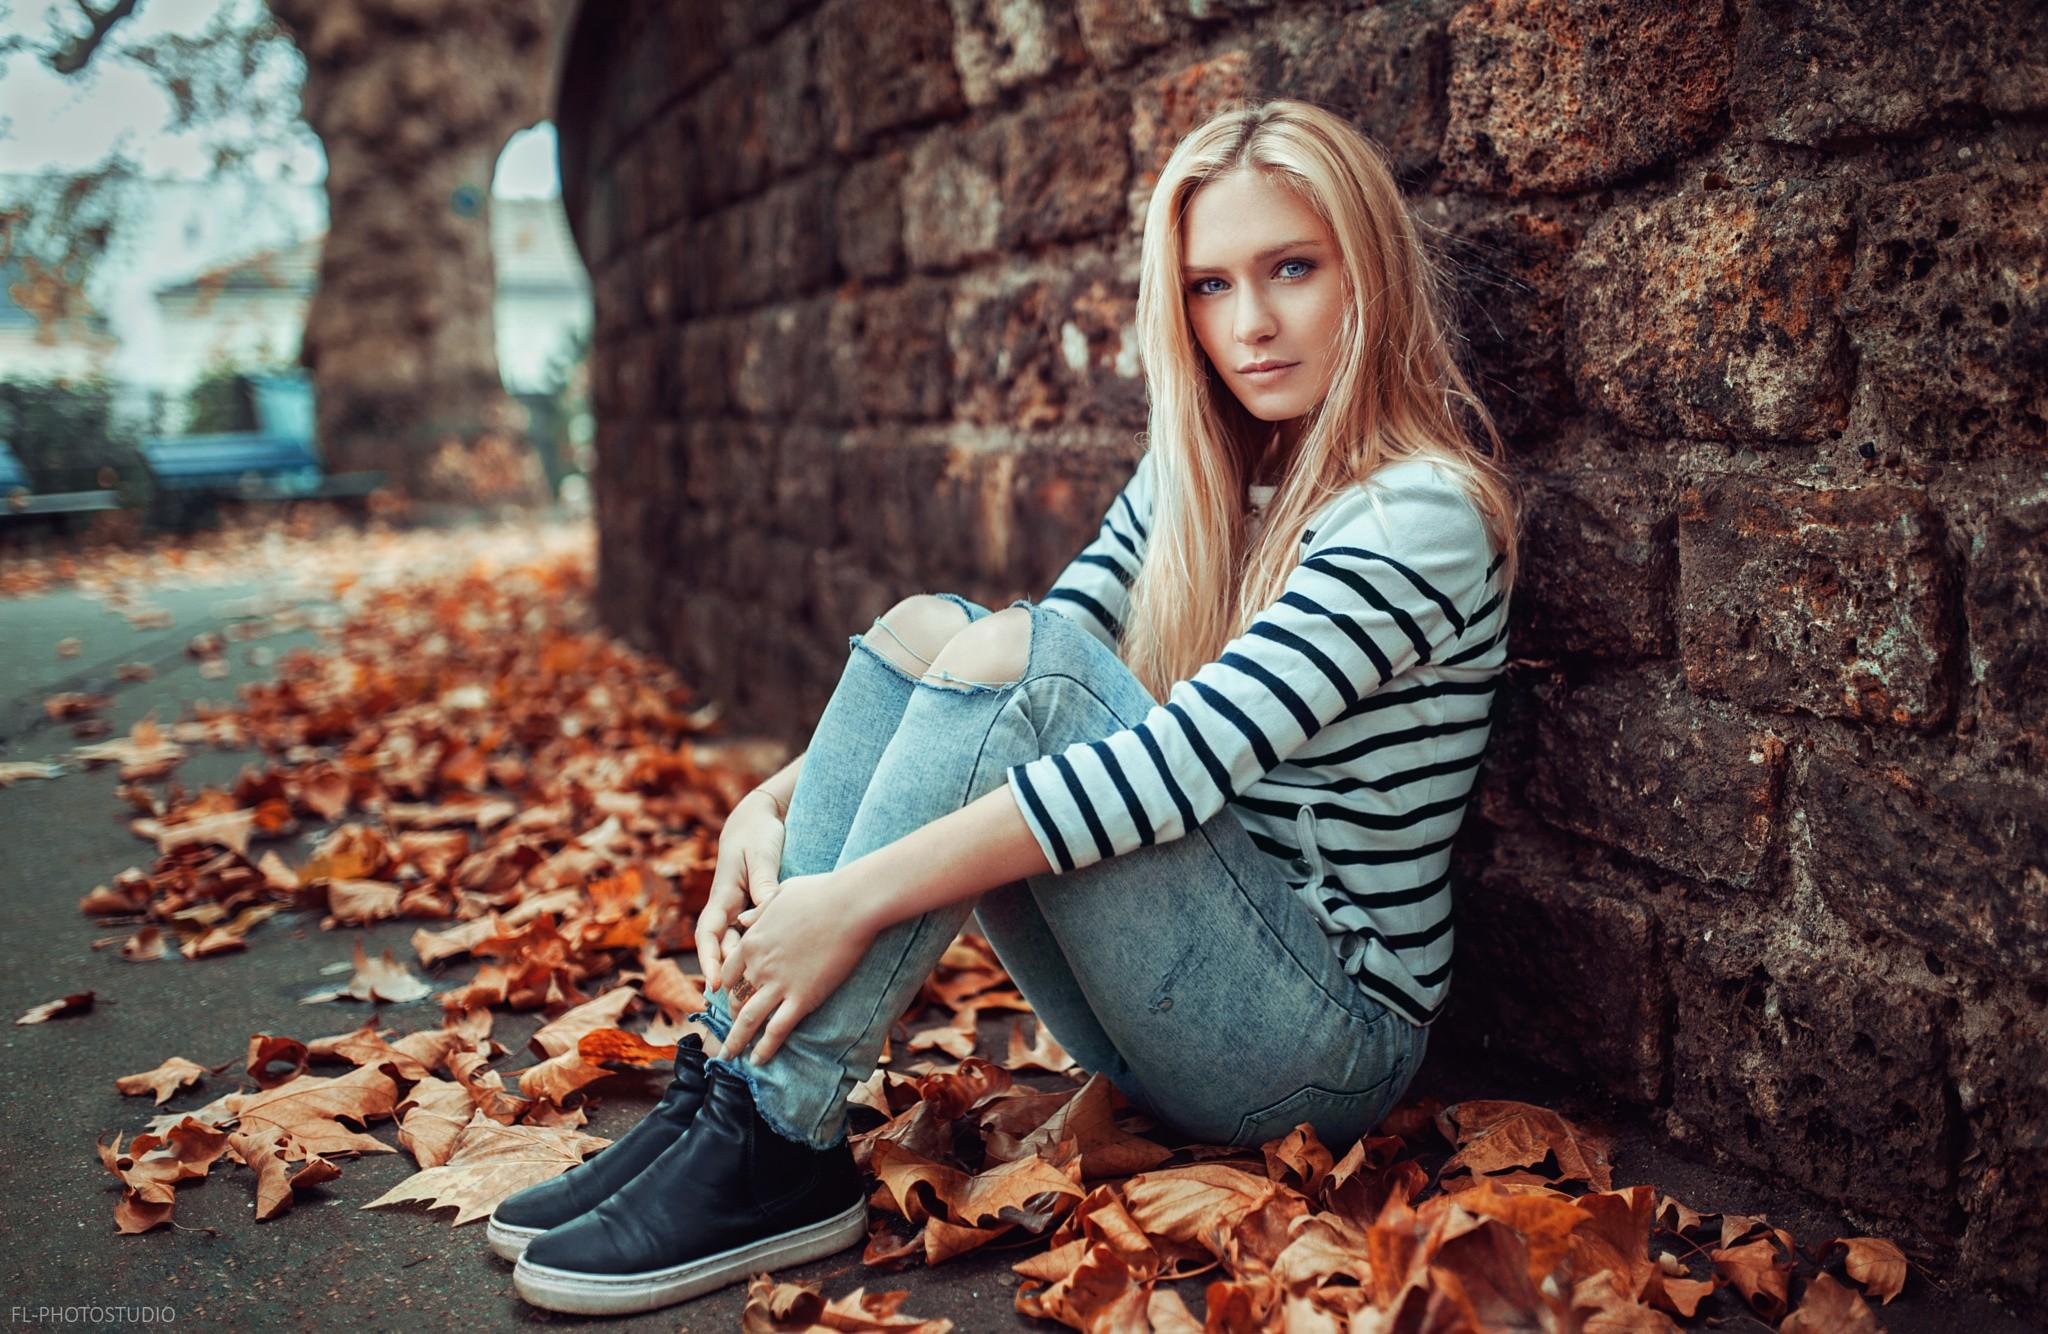 People 2048x1334 women blonde sitting looking at viewer pants jeans torn jeans sneakers leaves wall urban fall Eva Mikulski Lods Franck depth of field portrait sweatshirts